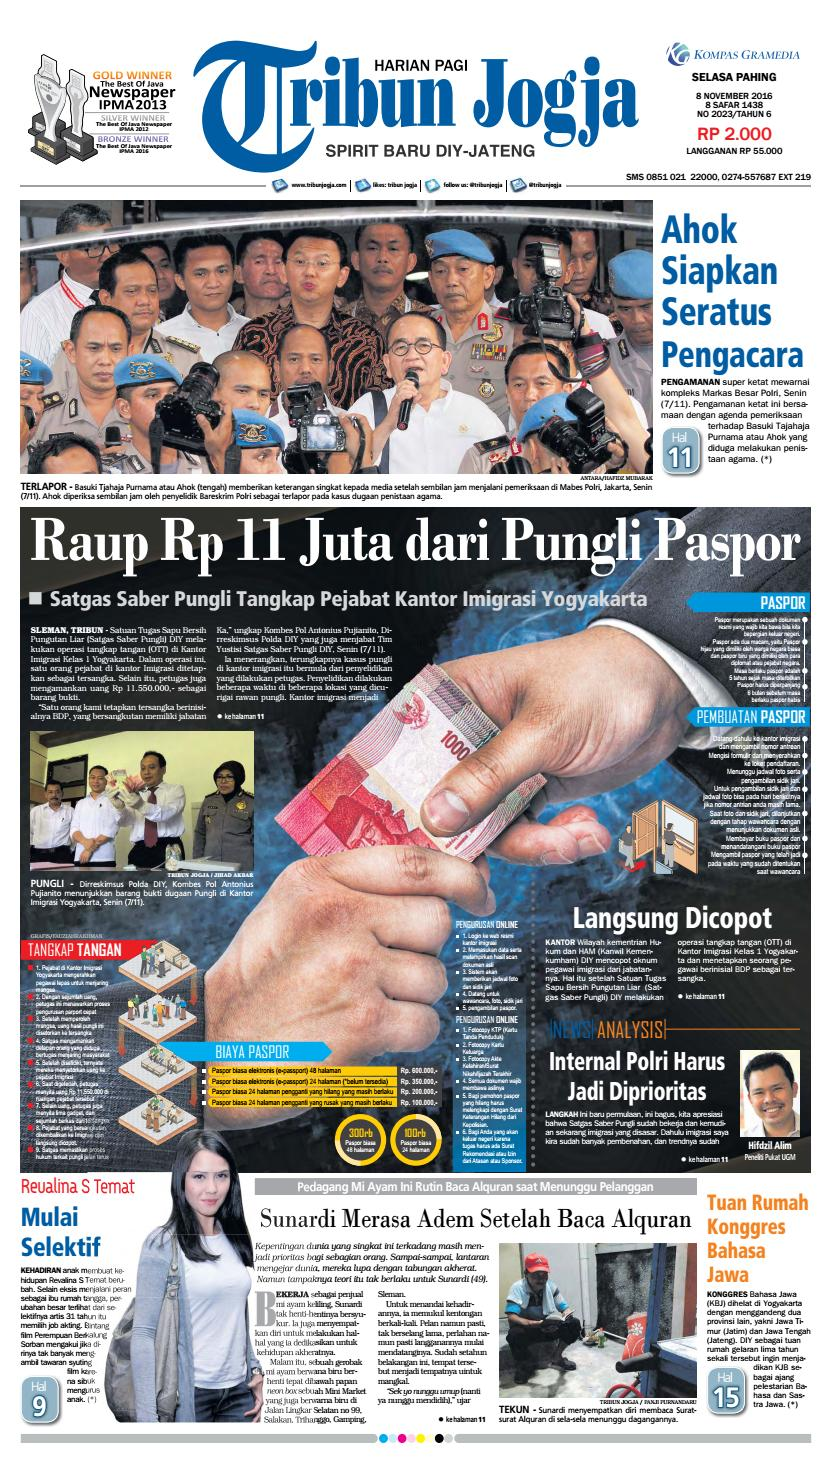 Tribunjogja 08 11 2016 By Tribun Jogja Issuu Produk Ukm Bumn Batik Tulis Warna Alam Ra Ampamp